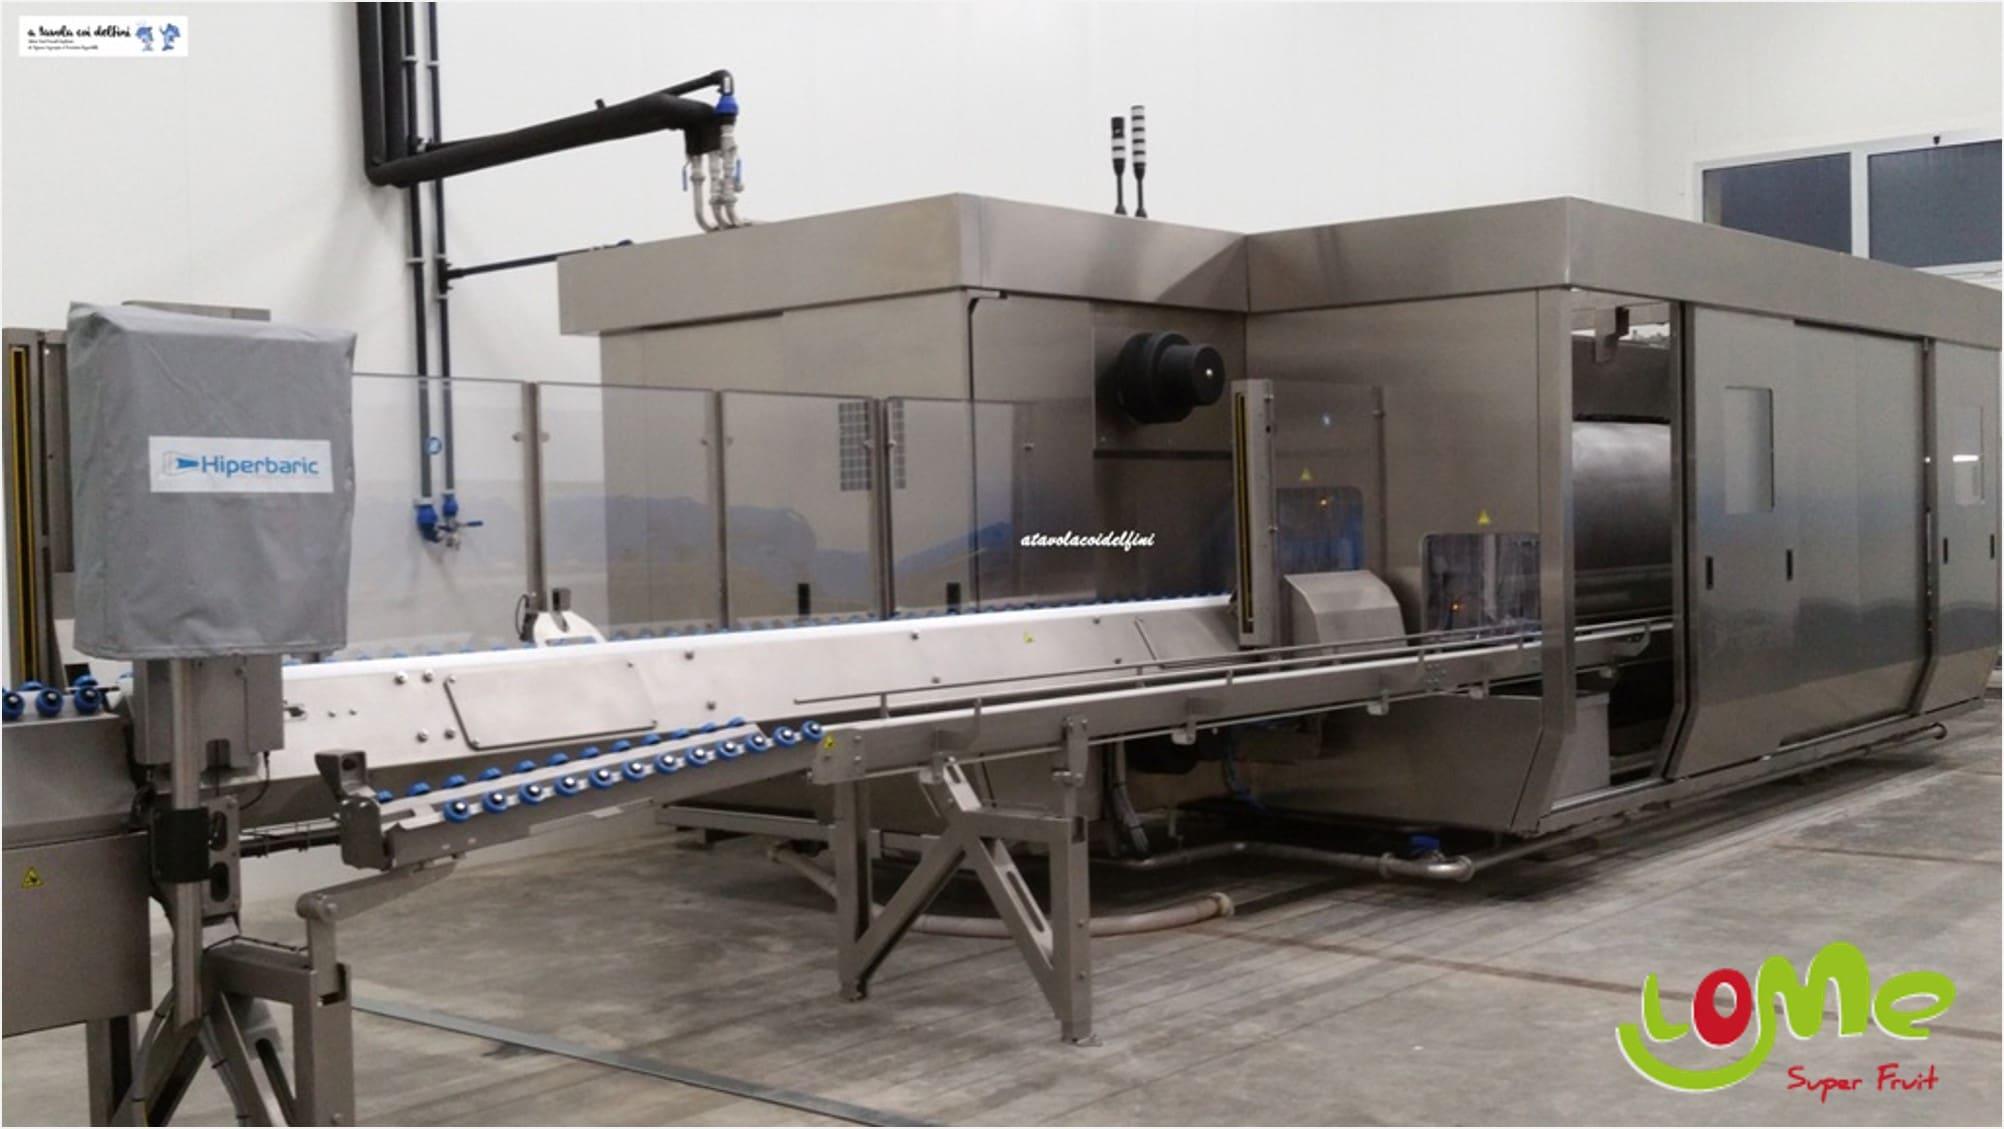 Hiperbaric 420 in the new facilities of Masseria Fruttirossi in Castellaneta. Source: https://www.atavolacoidelfini.com